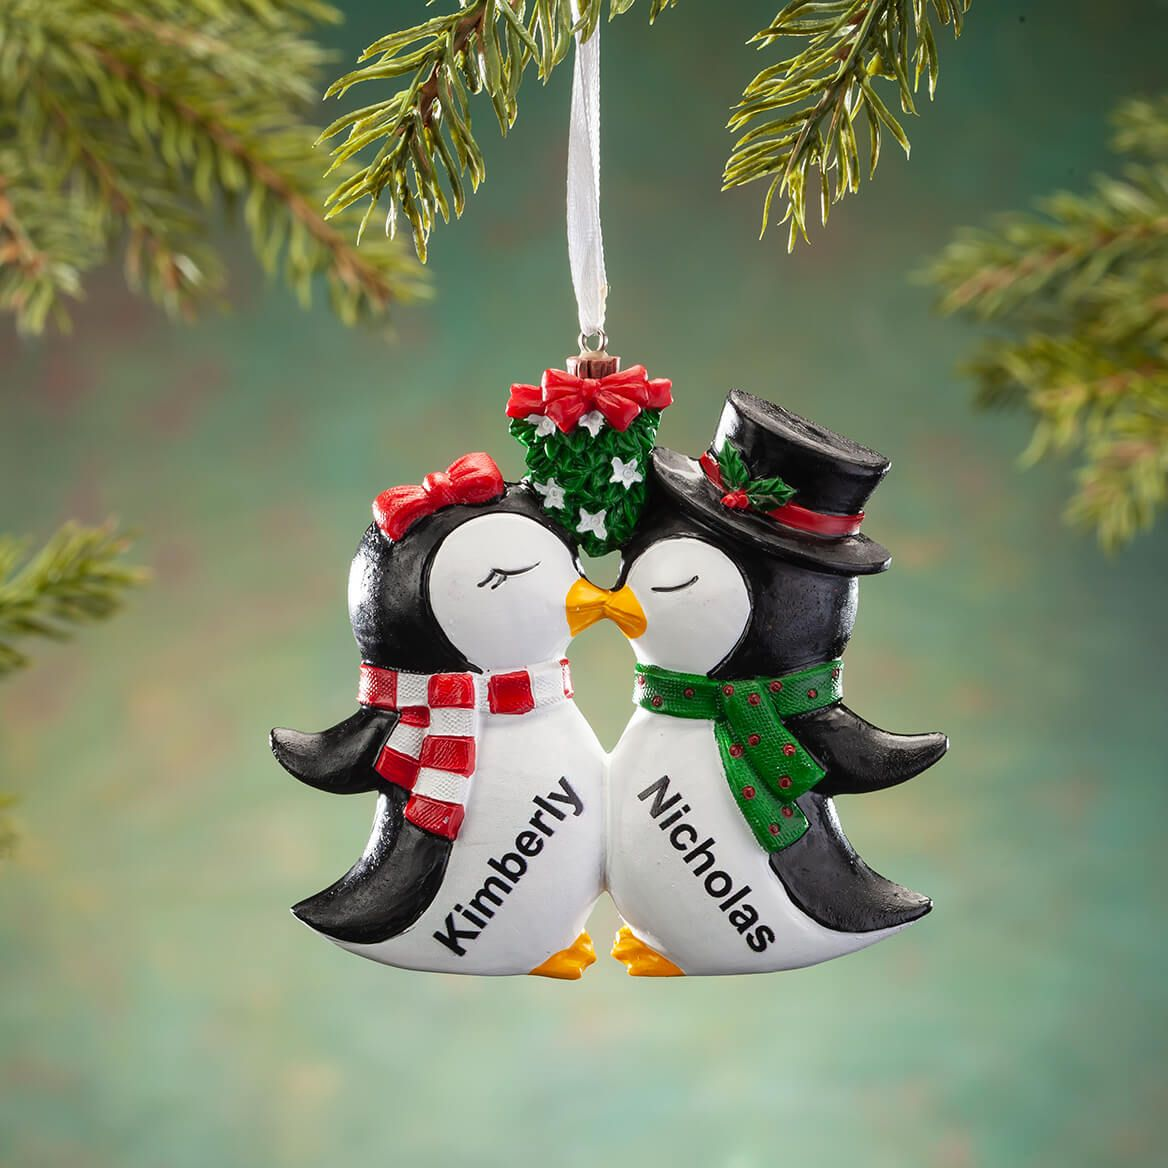 Personalized Kissing Penguins Ornament-368173